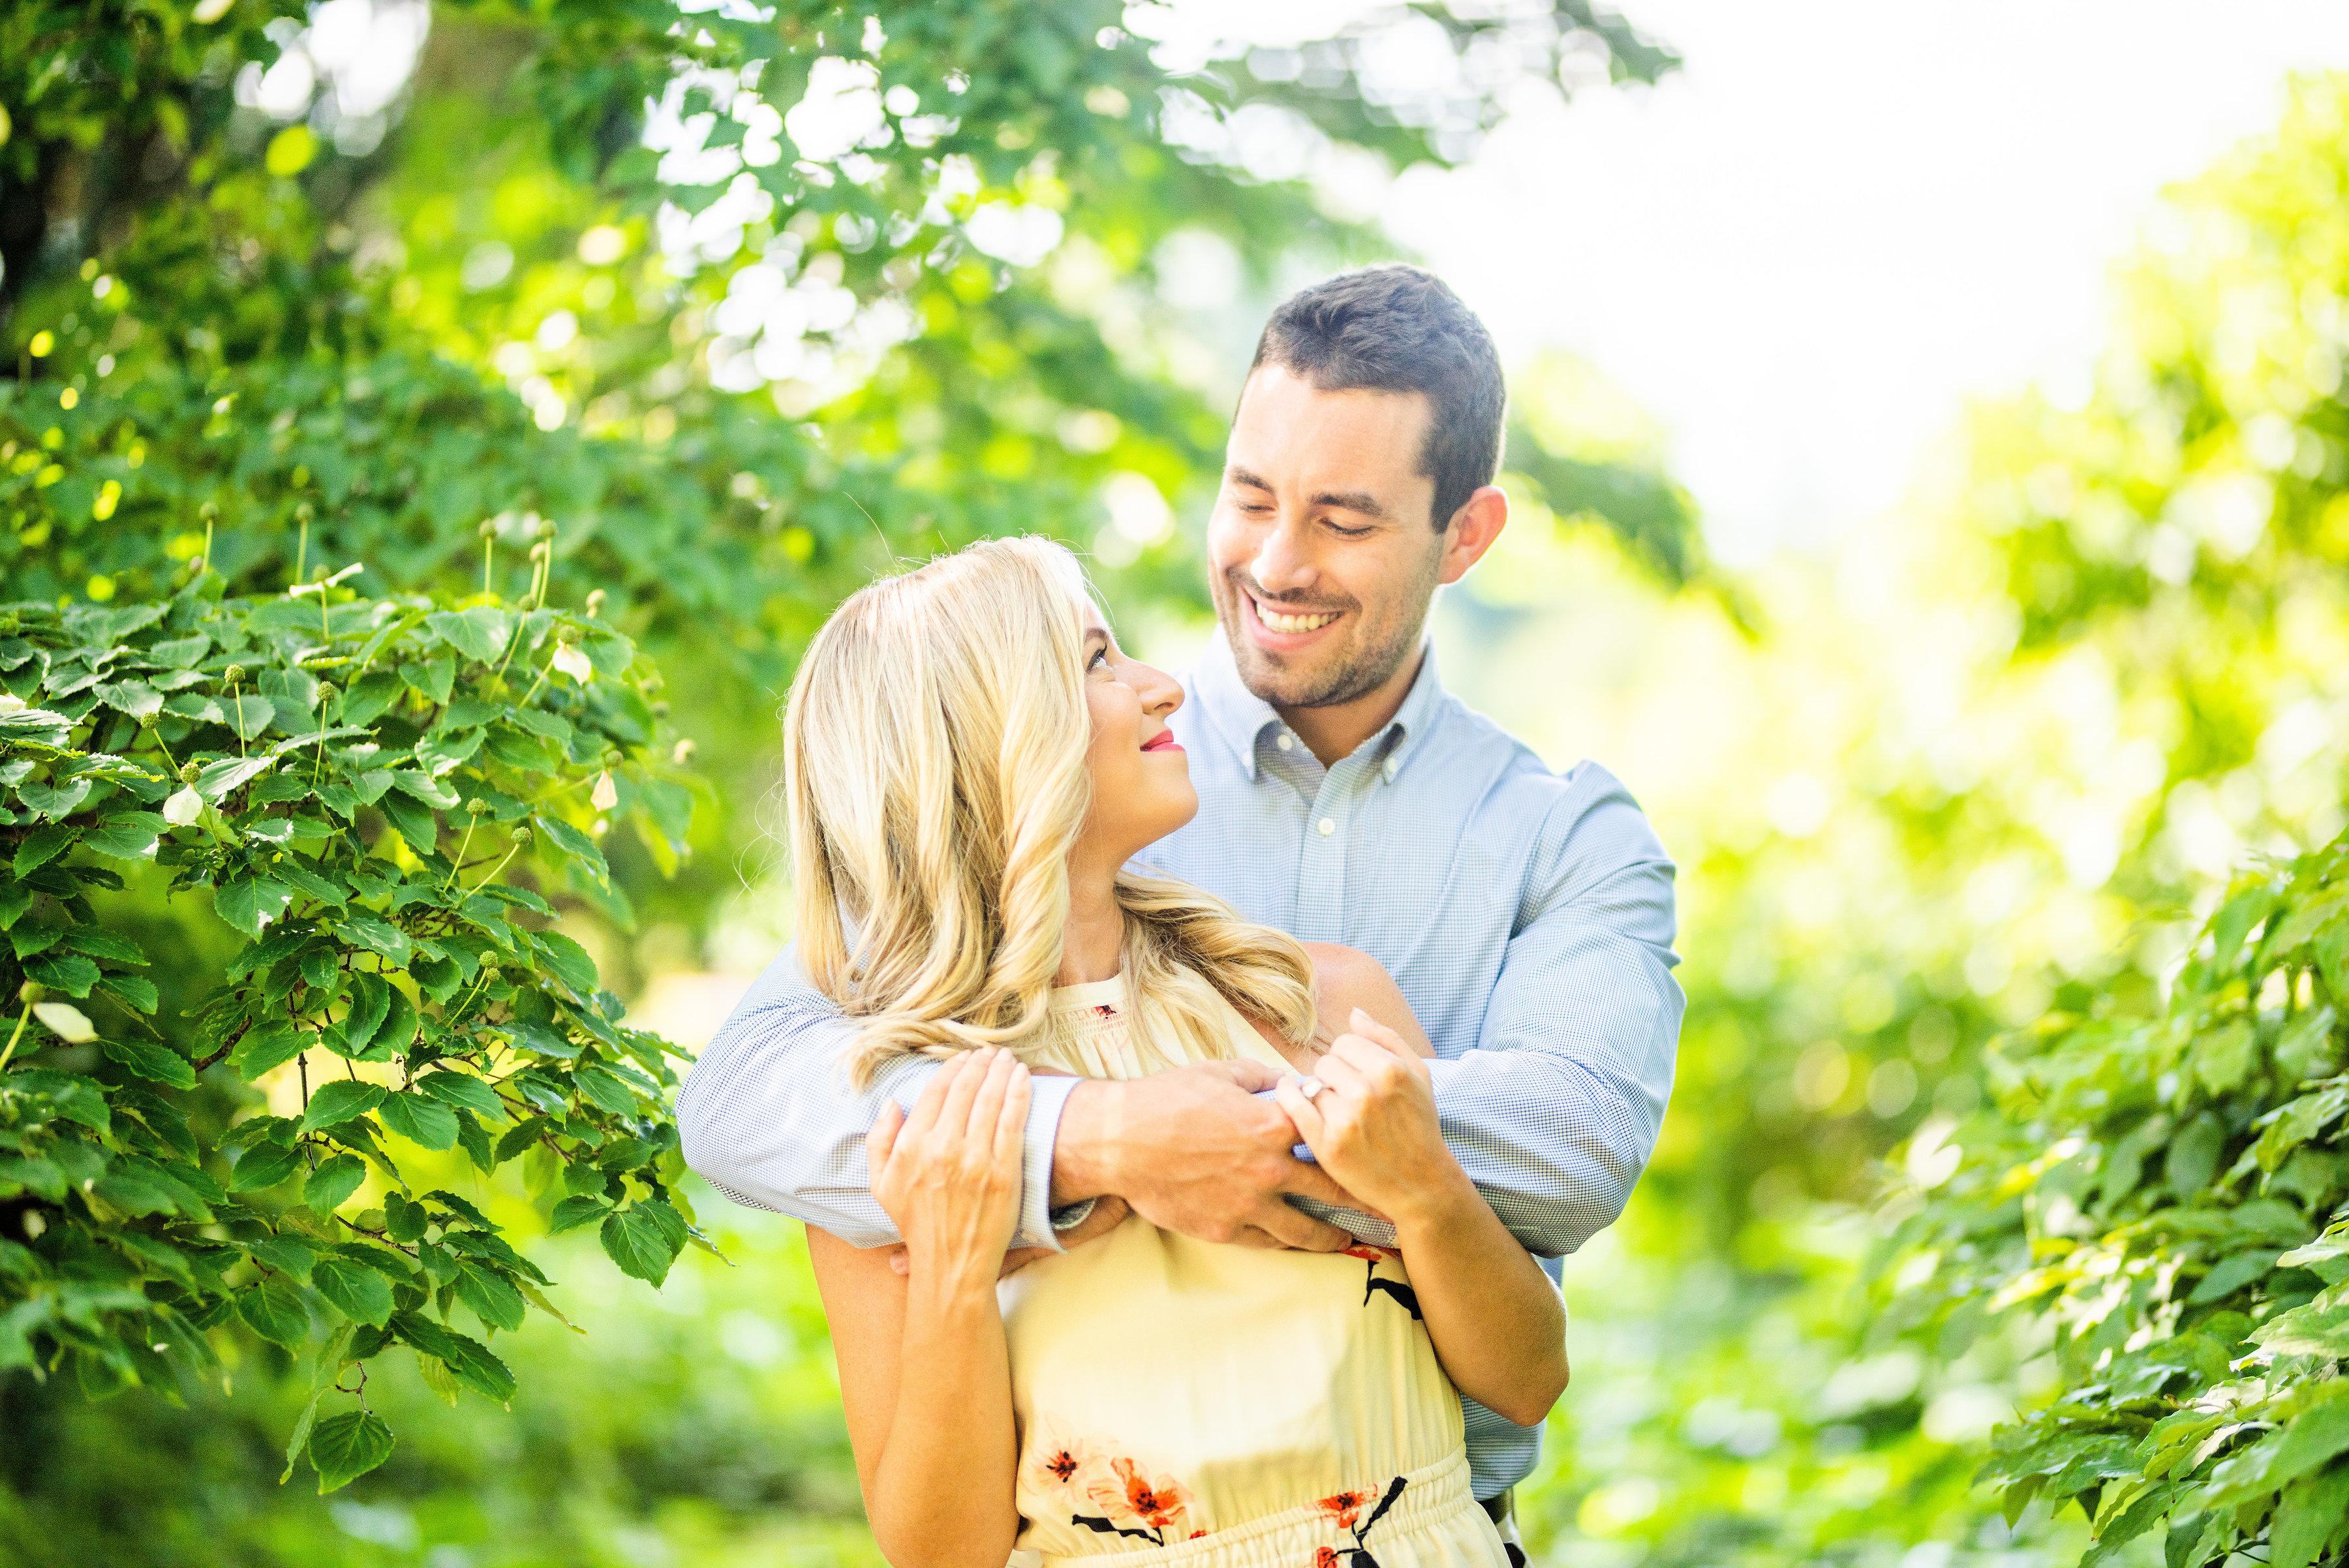 Planting Fields Arboretum Engagement Shoot | Oyster Bay Engagement Shoot | Long Island Wedding Photographer14